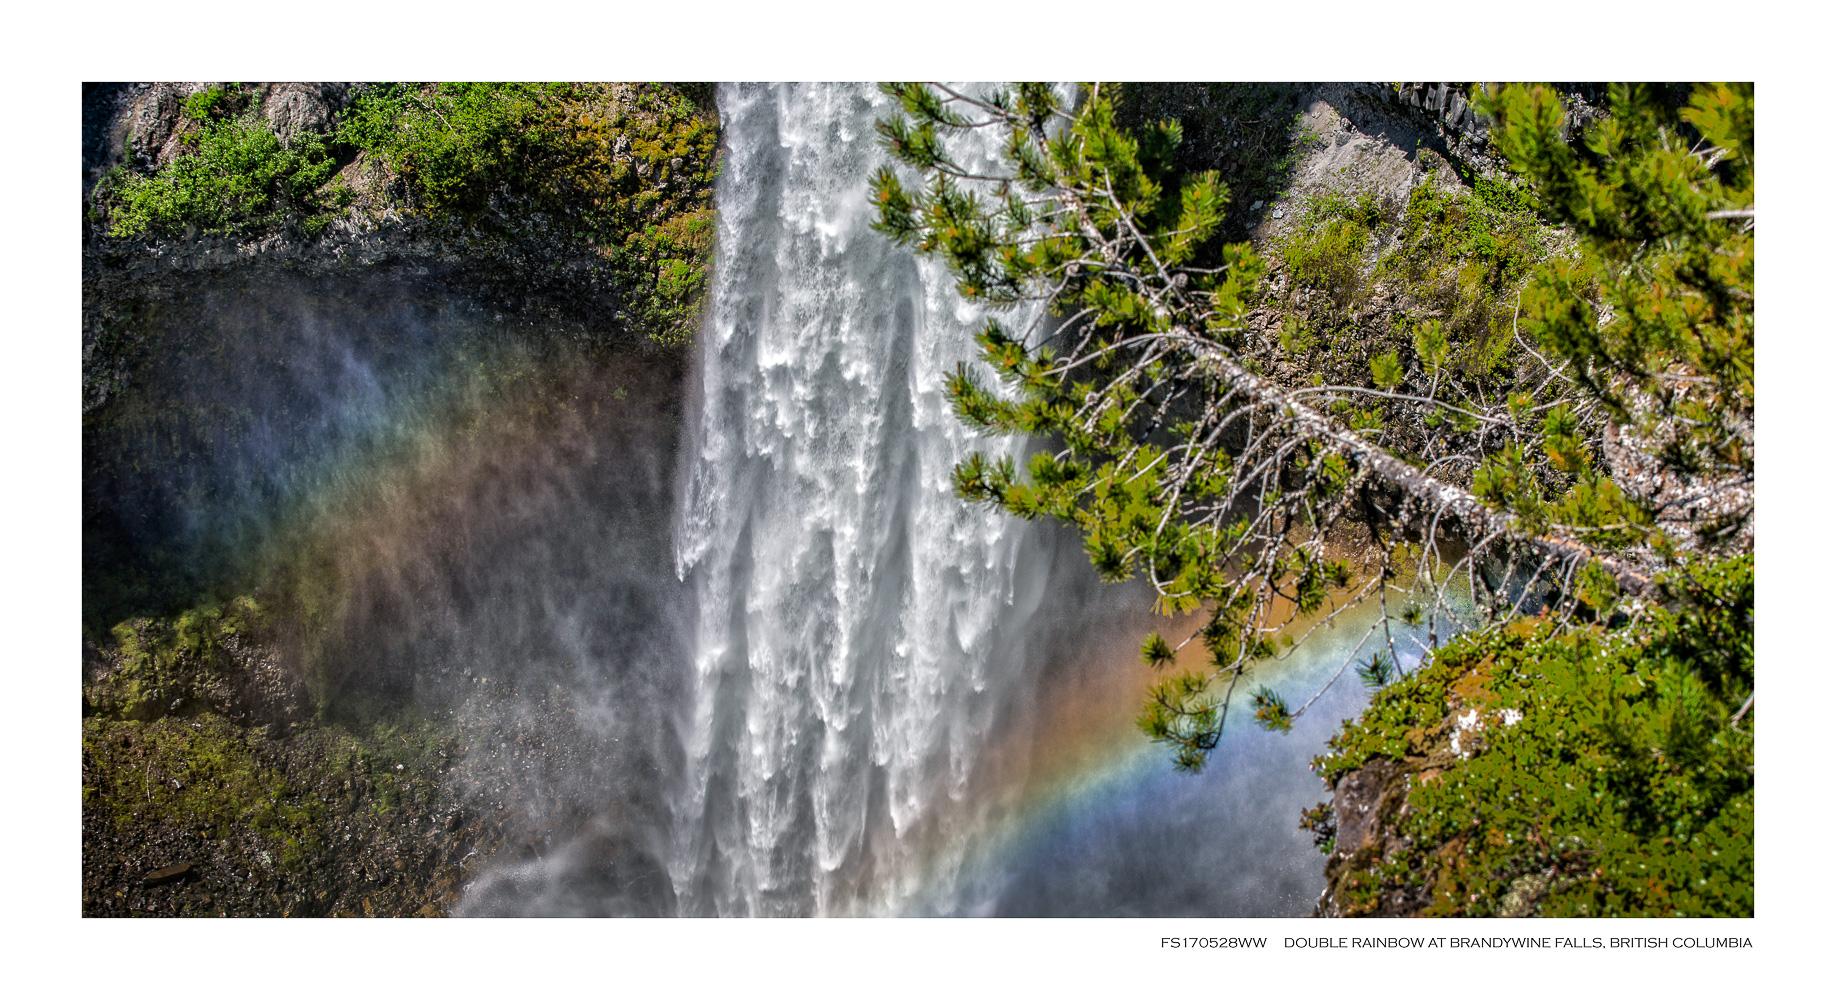 Photo Gallery – www.fotosquares.com